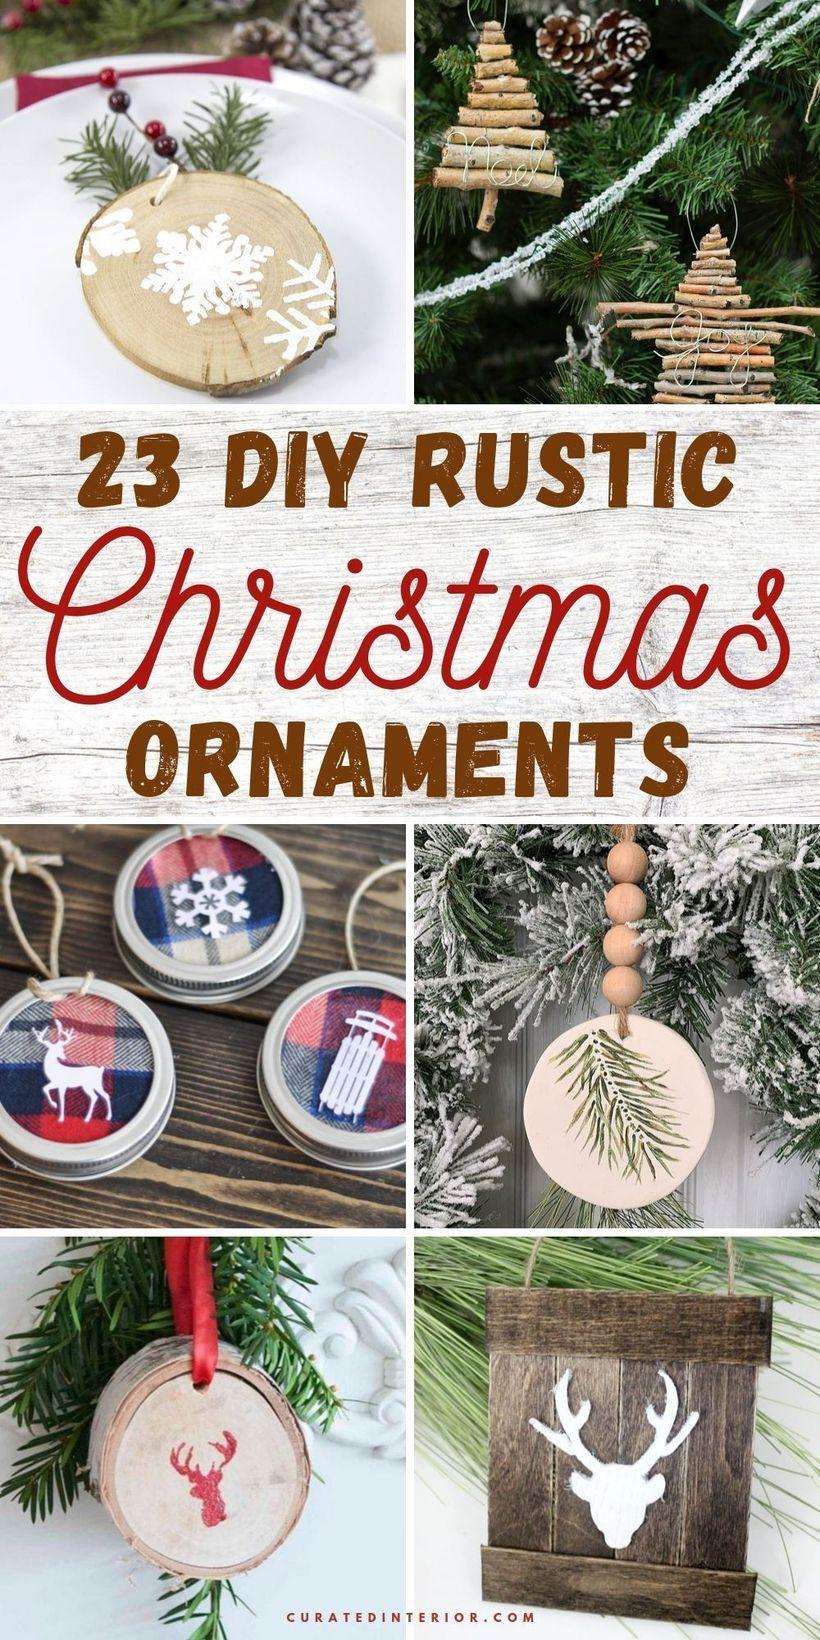 23 Diy Rustic Christmas Ornaments To Hang On Your Tree Rustic Christmas Ornaments Diy Christmas Ornaments Rustic Christmas